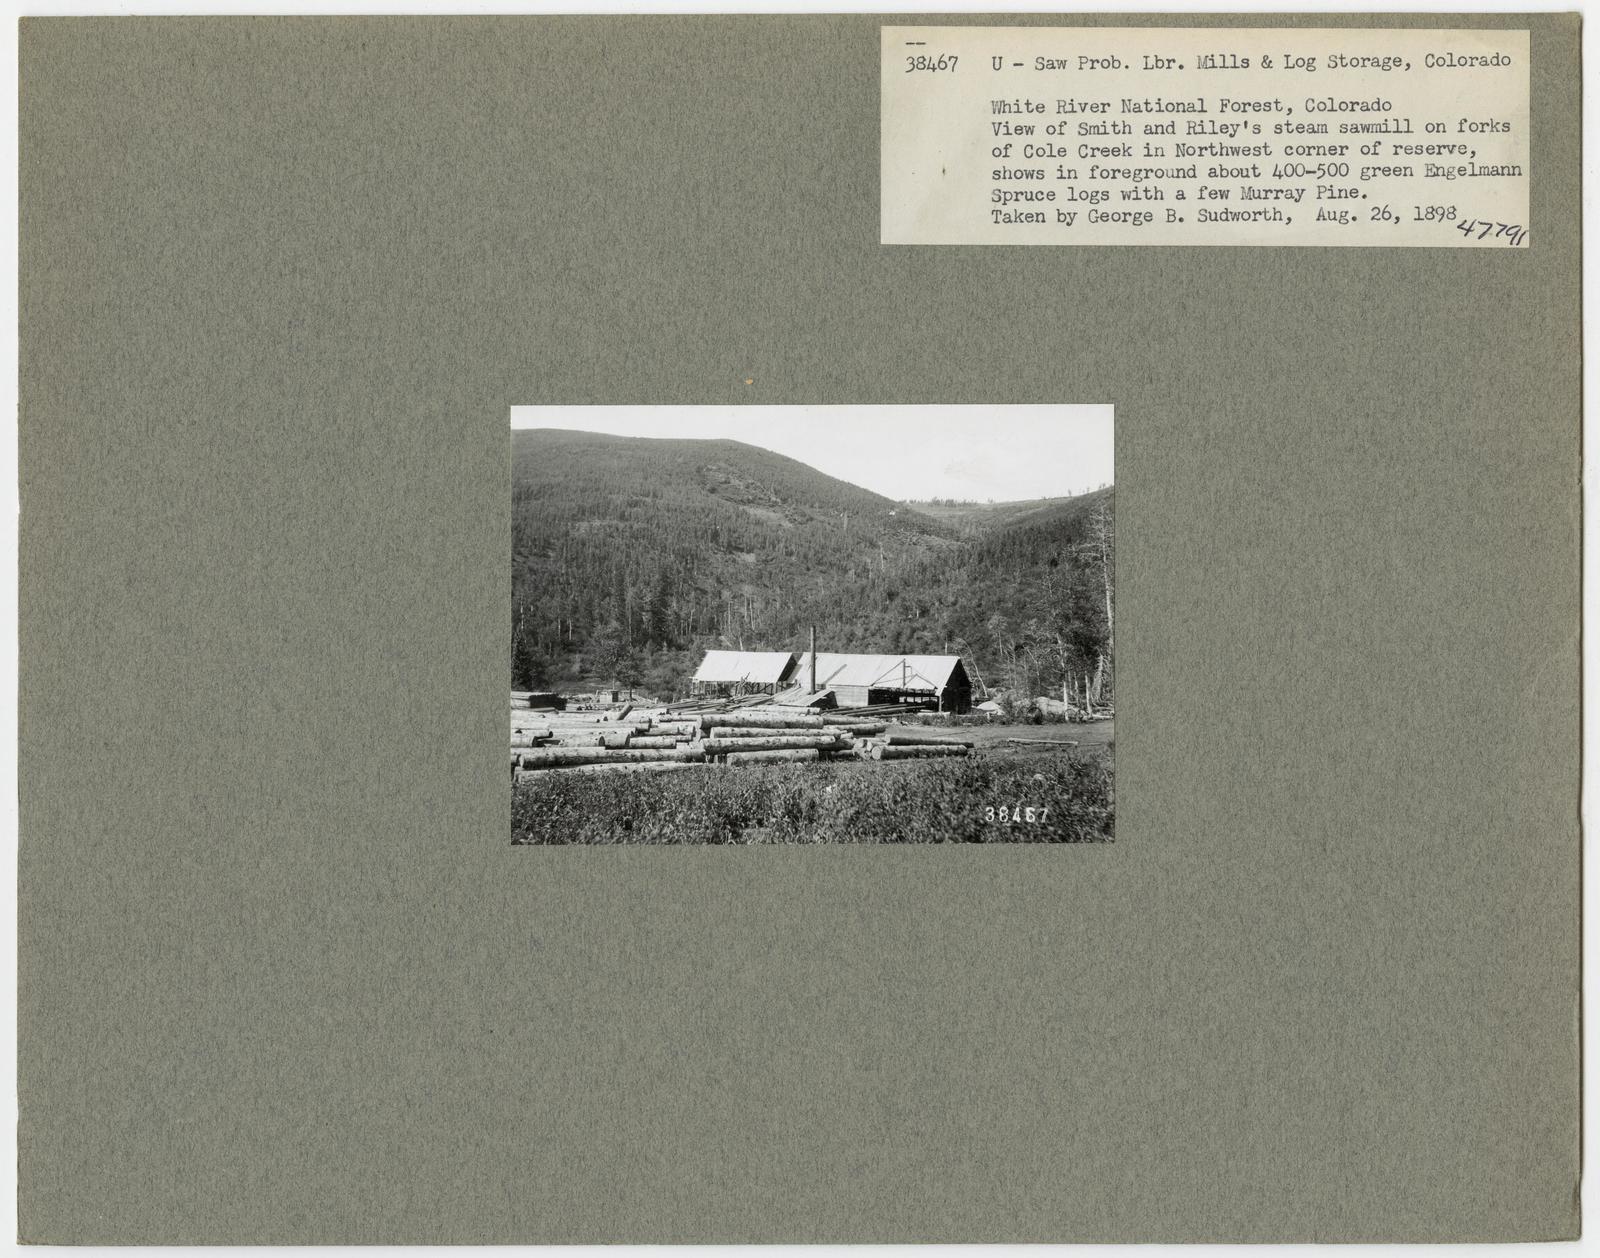 Mills, Milling and Log Storage - Colorado